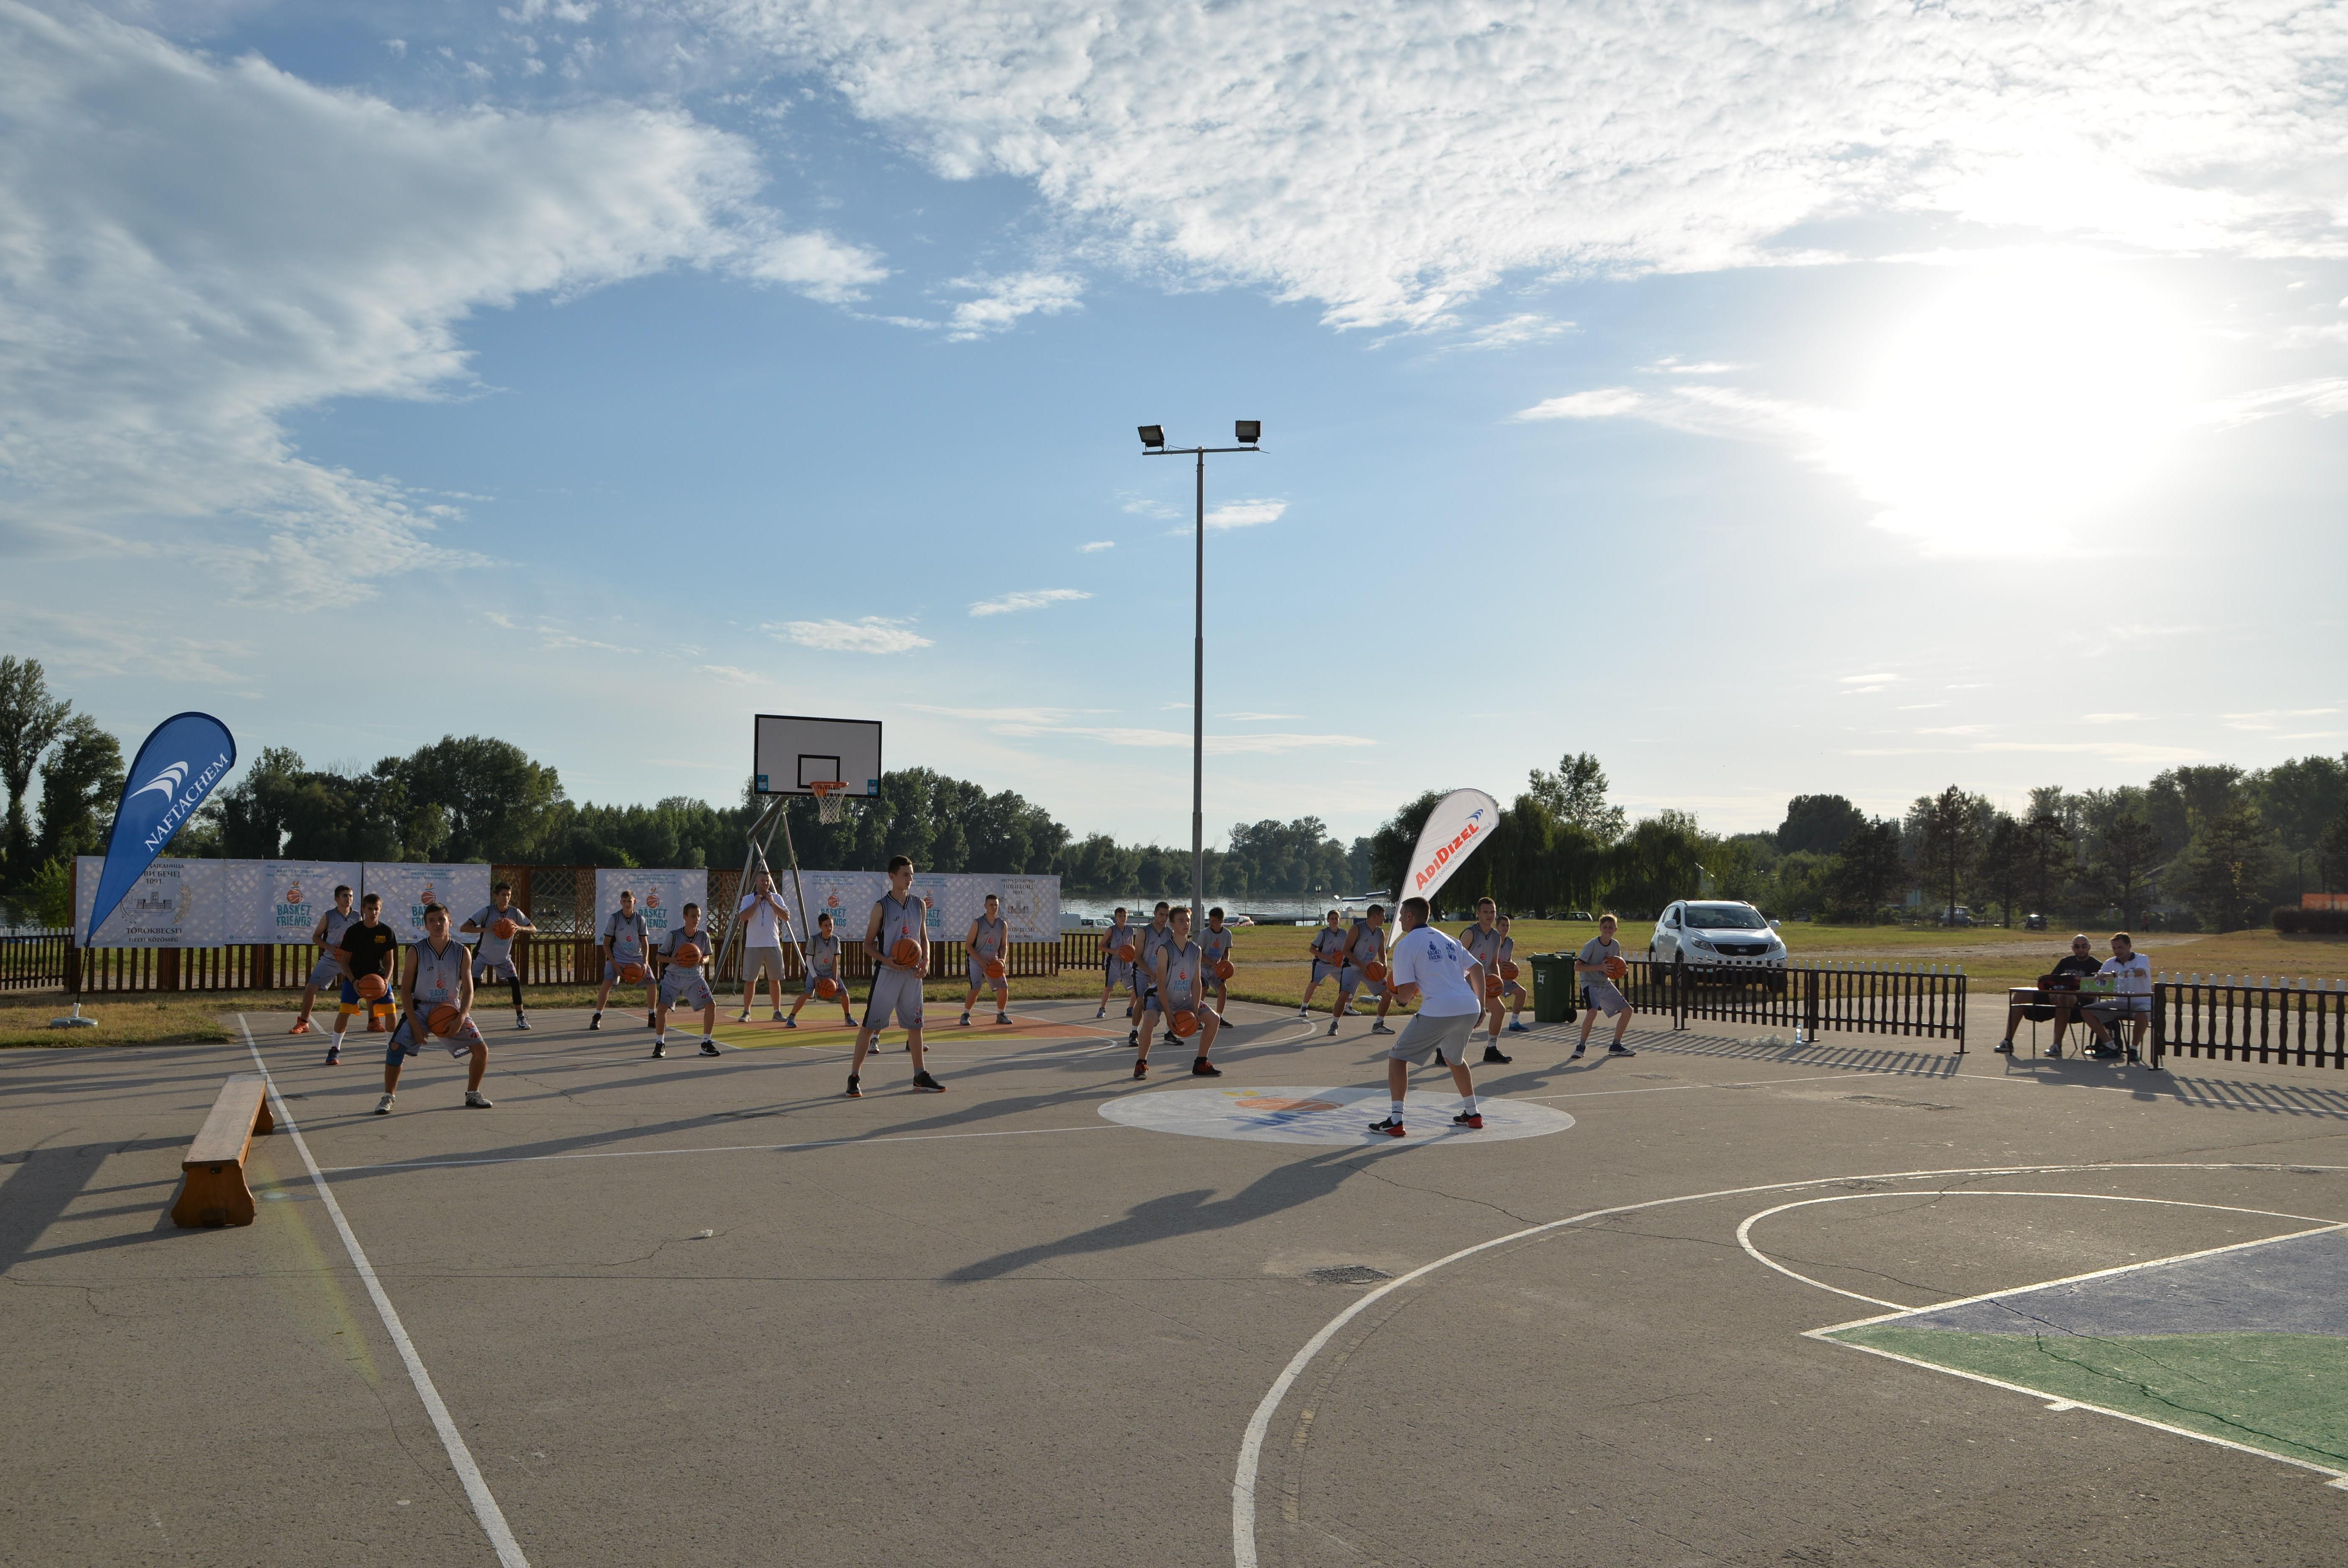 Basketfriends 2017. - basics of basketball training